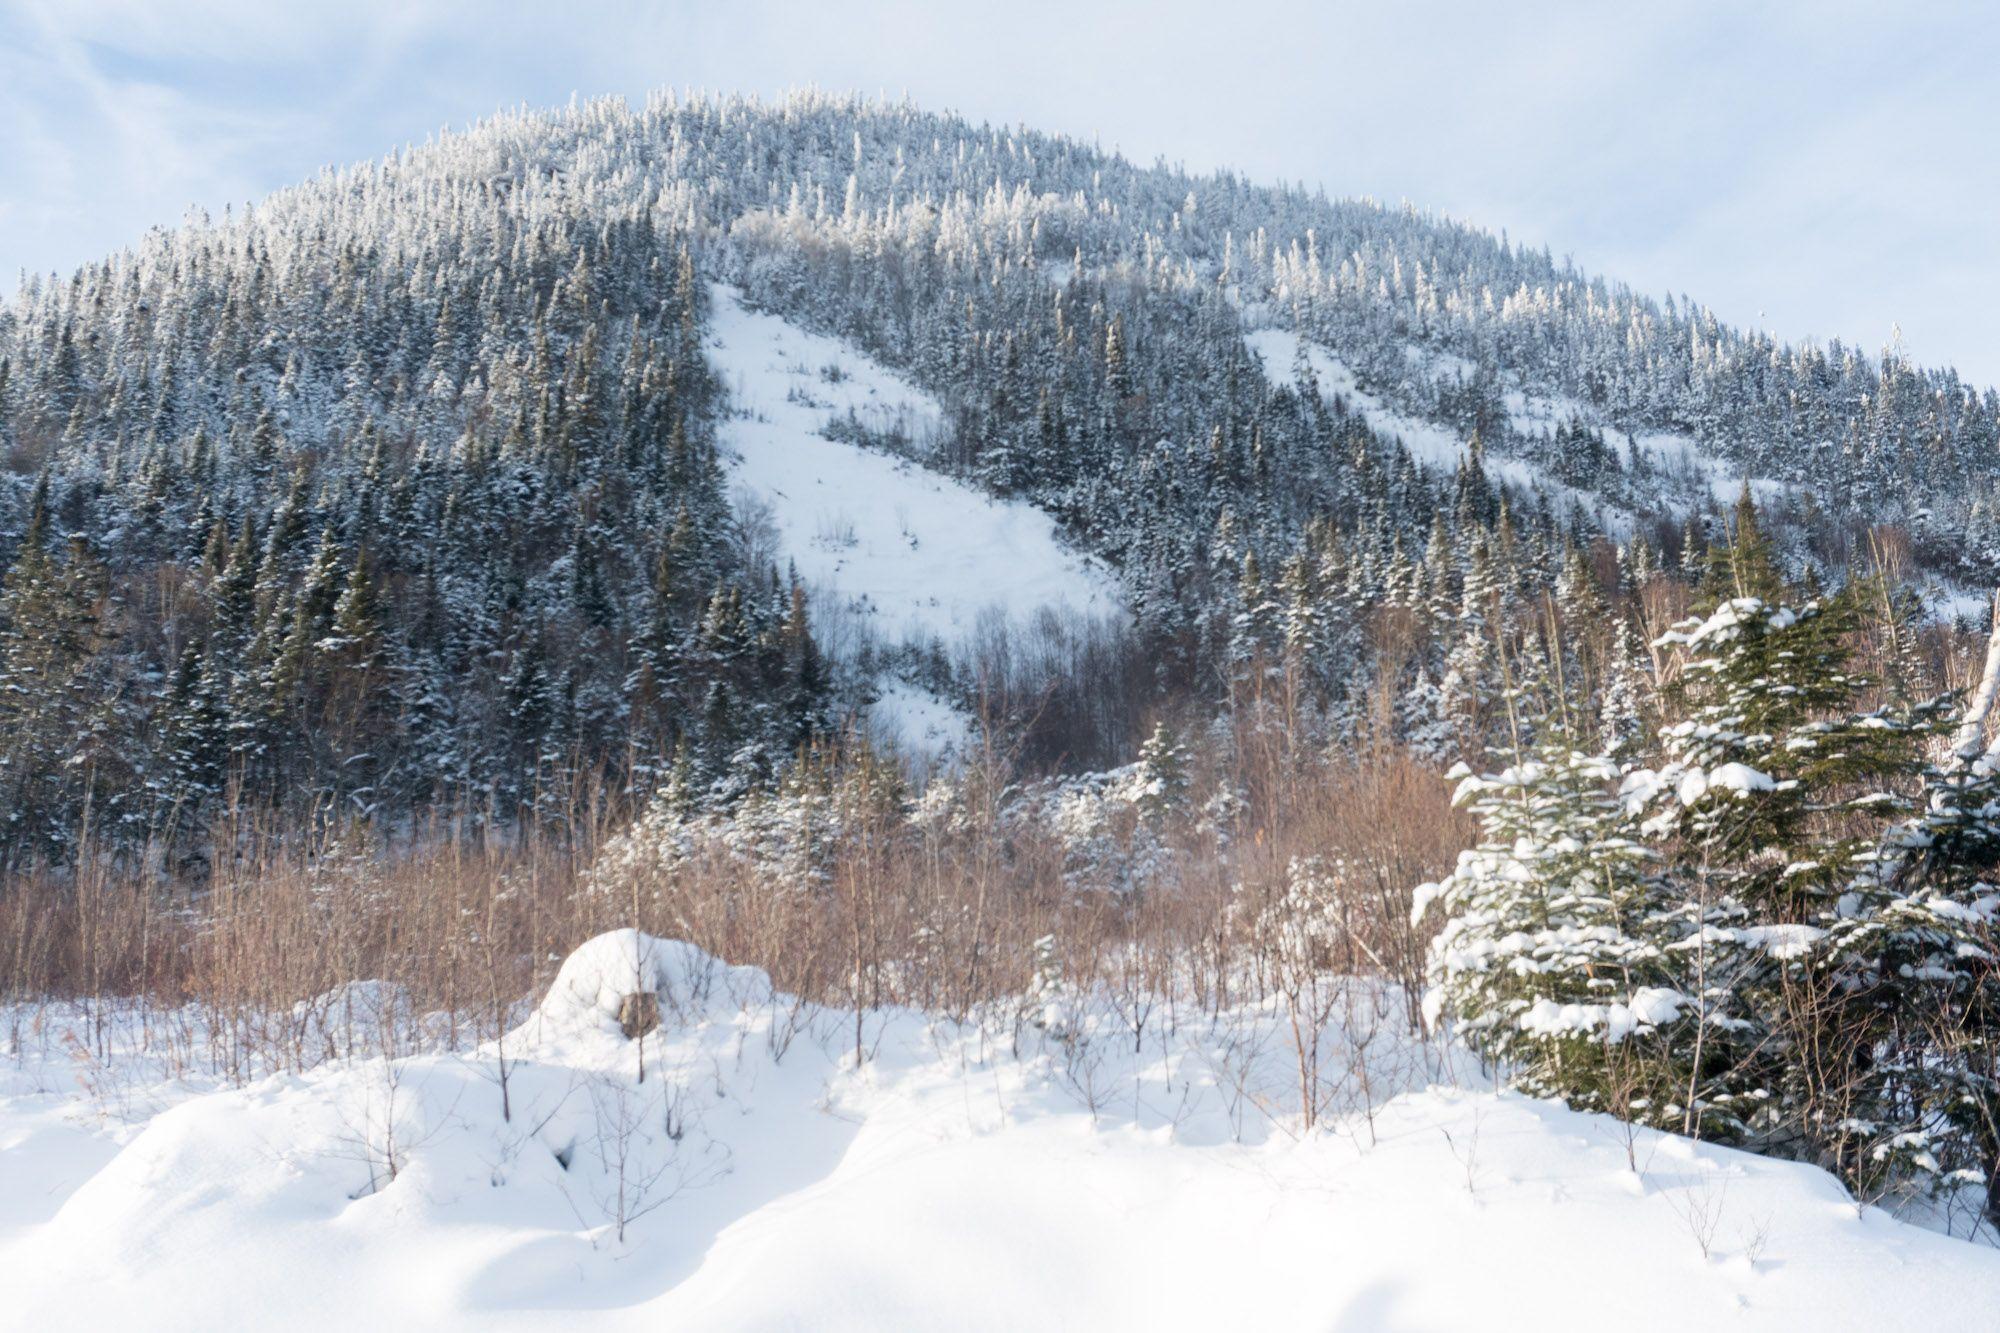 Thomas-Thiery-skieur-Nicolas-Cloutier-dos-de-cheval-8